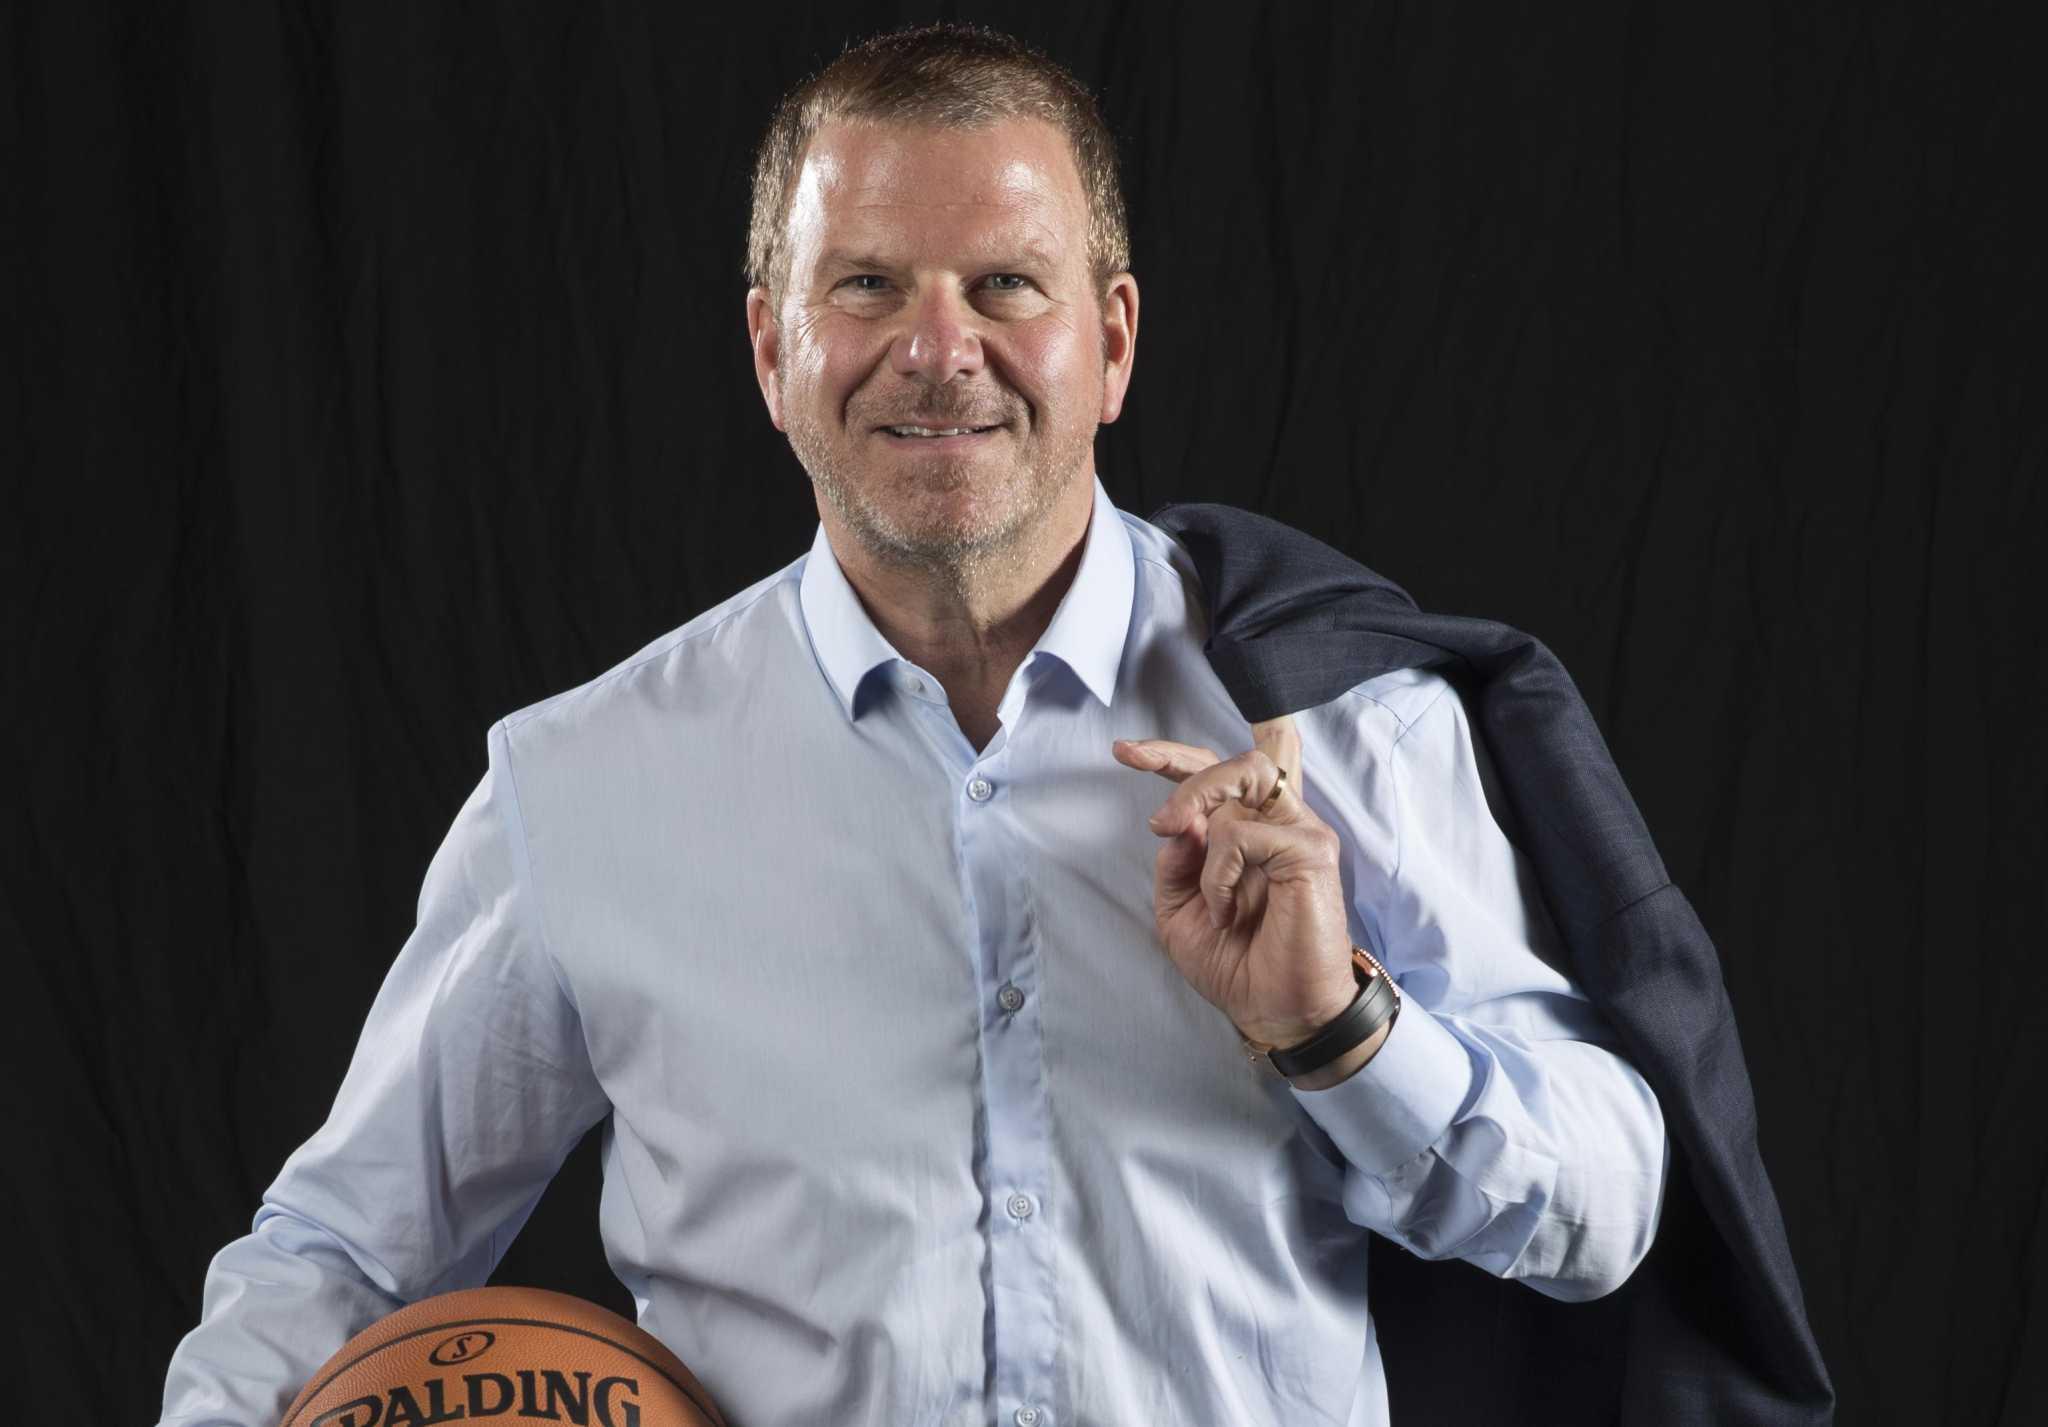 Tilman Fertitta Q&A: On NBA's return, Rockets' title hopes and George Floyd